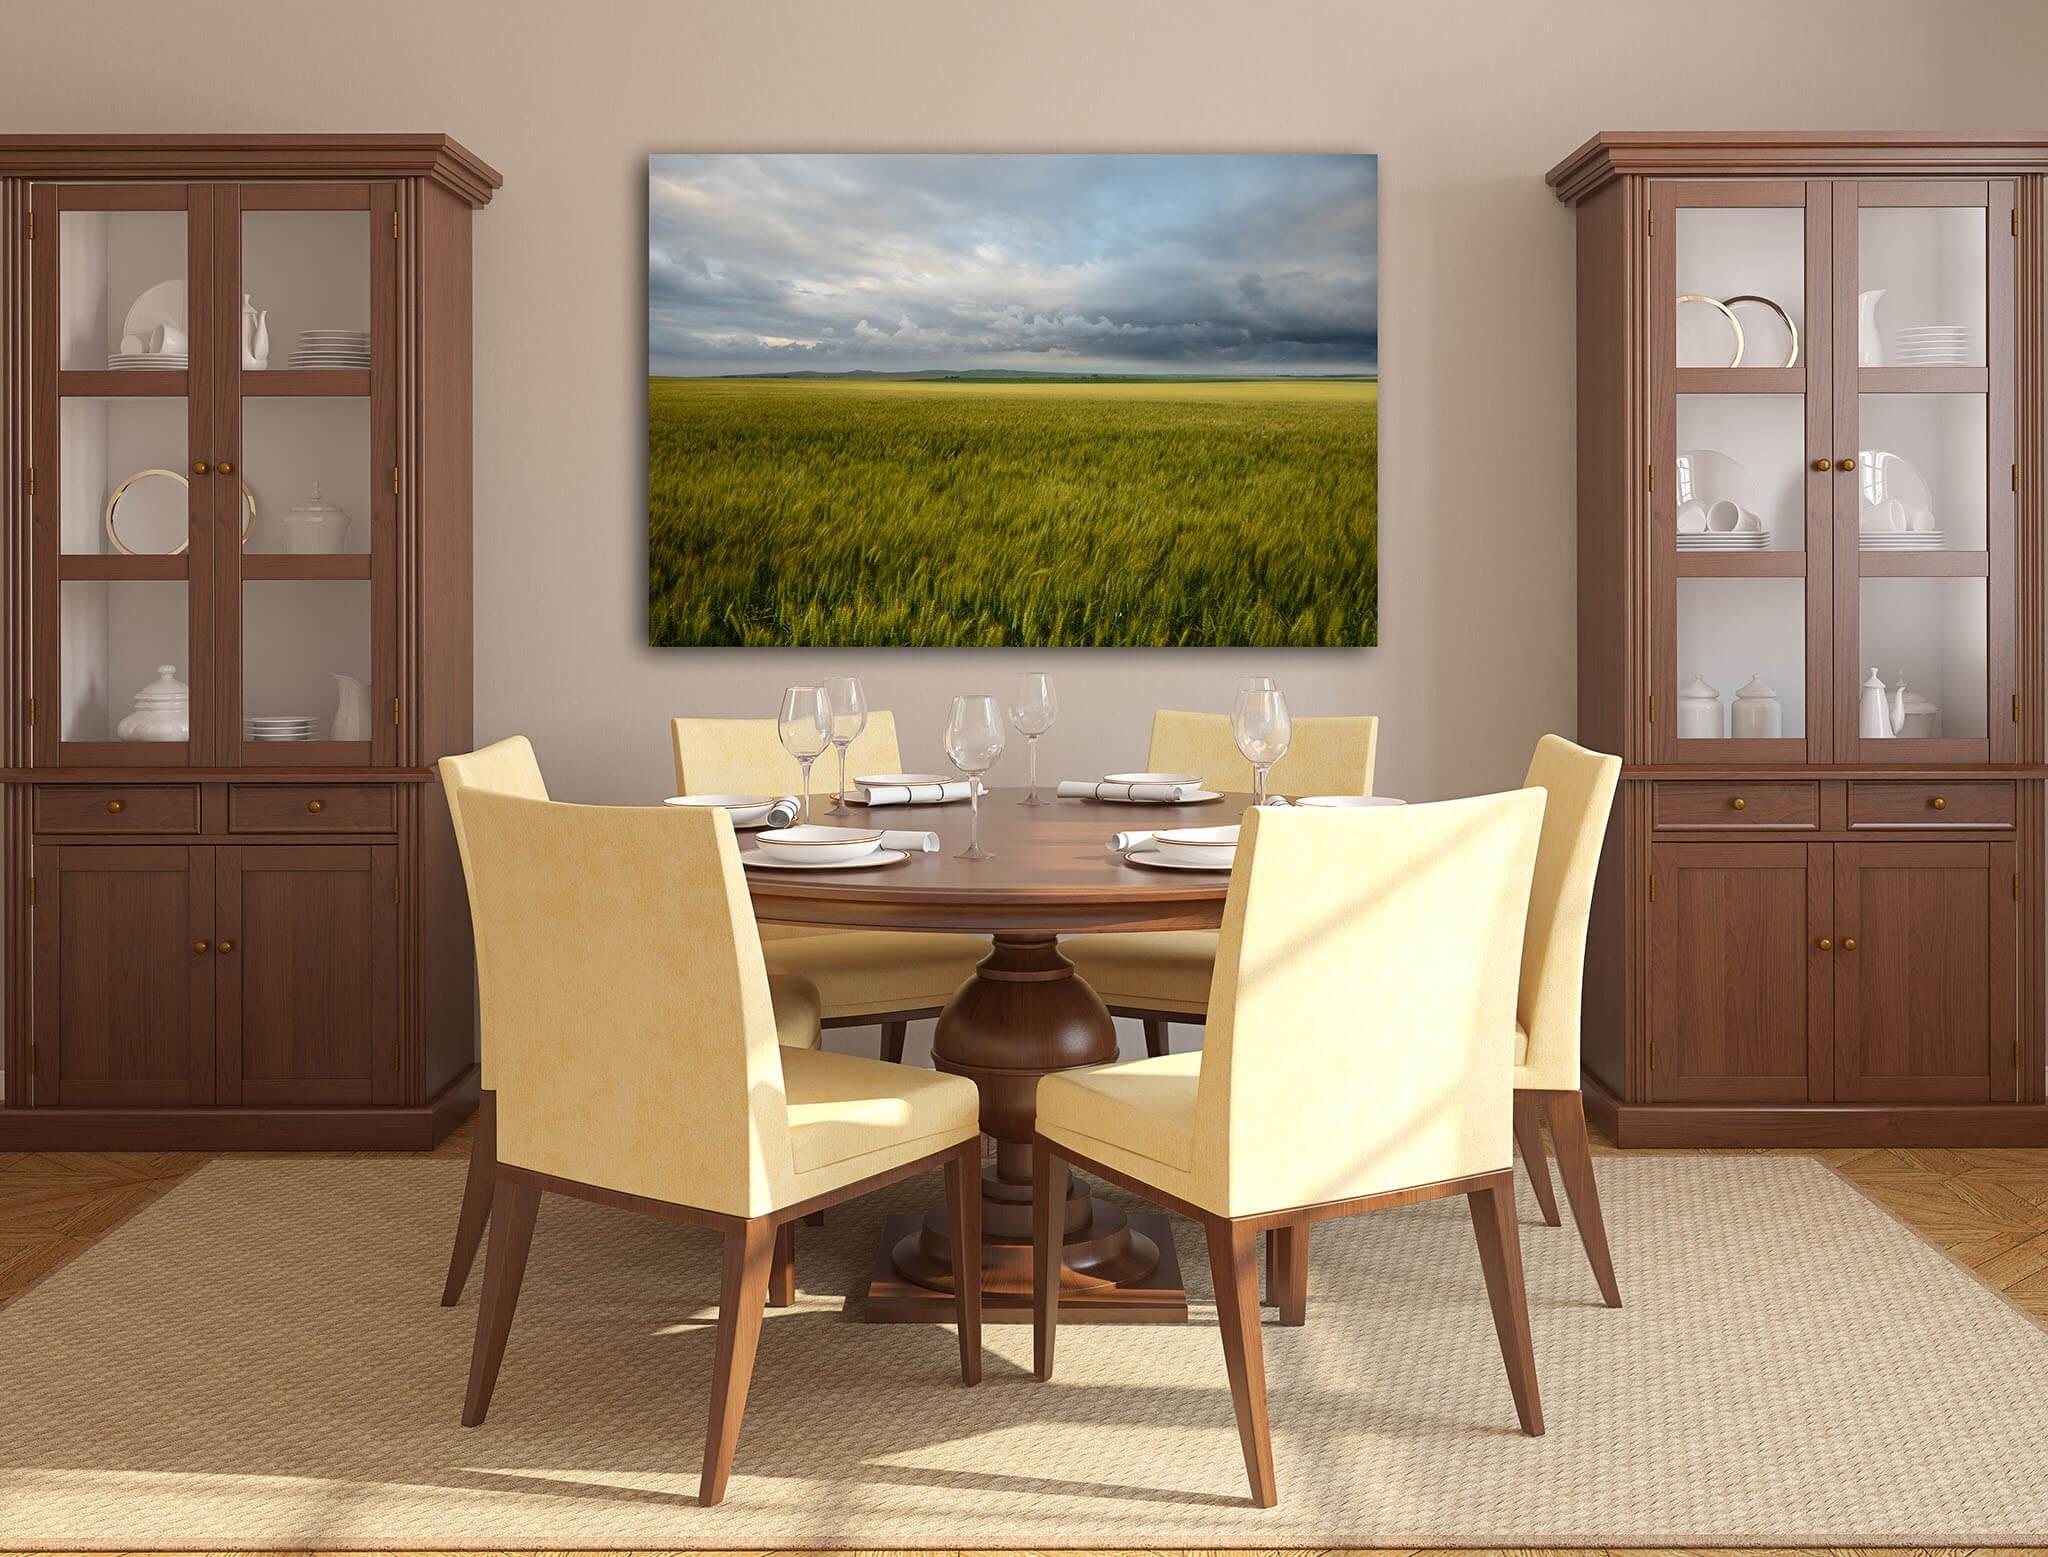 Kitchen & Dining Room Wall Art – Franklin Arts Pertaining To Dining Room Wall Art (View 19 of 20)